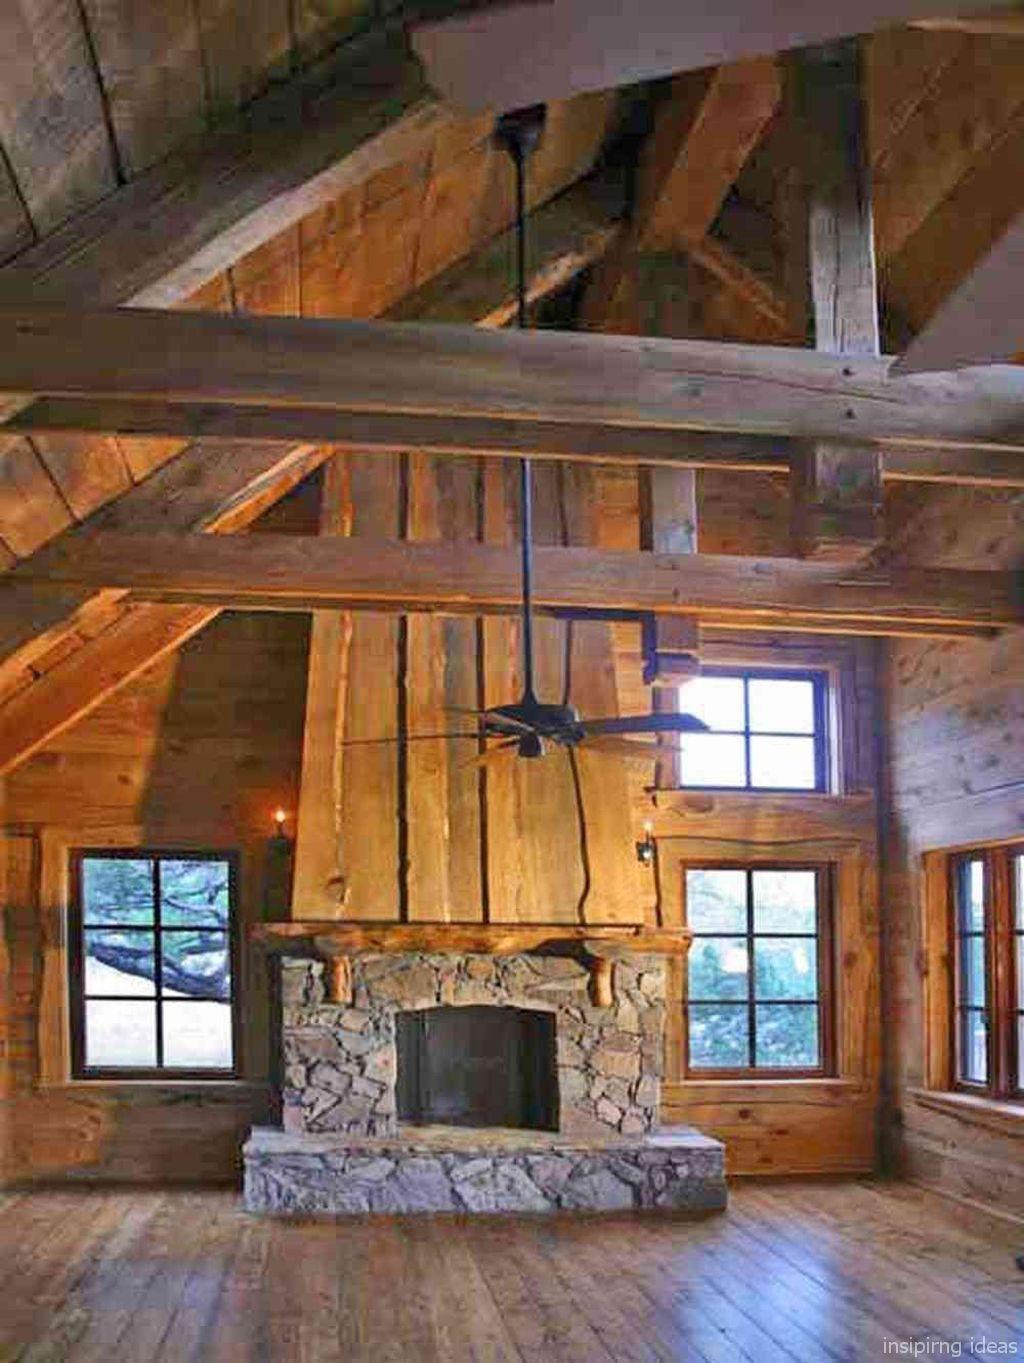 71 Rustic Log Cabin Homes Design Ideas Loghomeinteriorsrustic